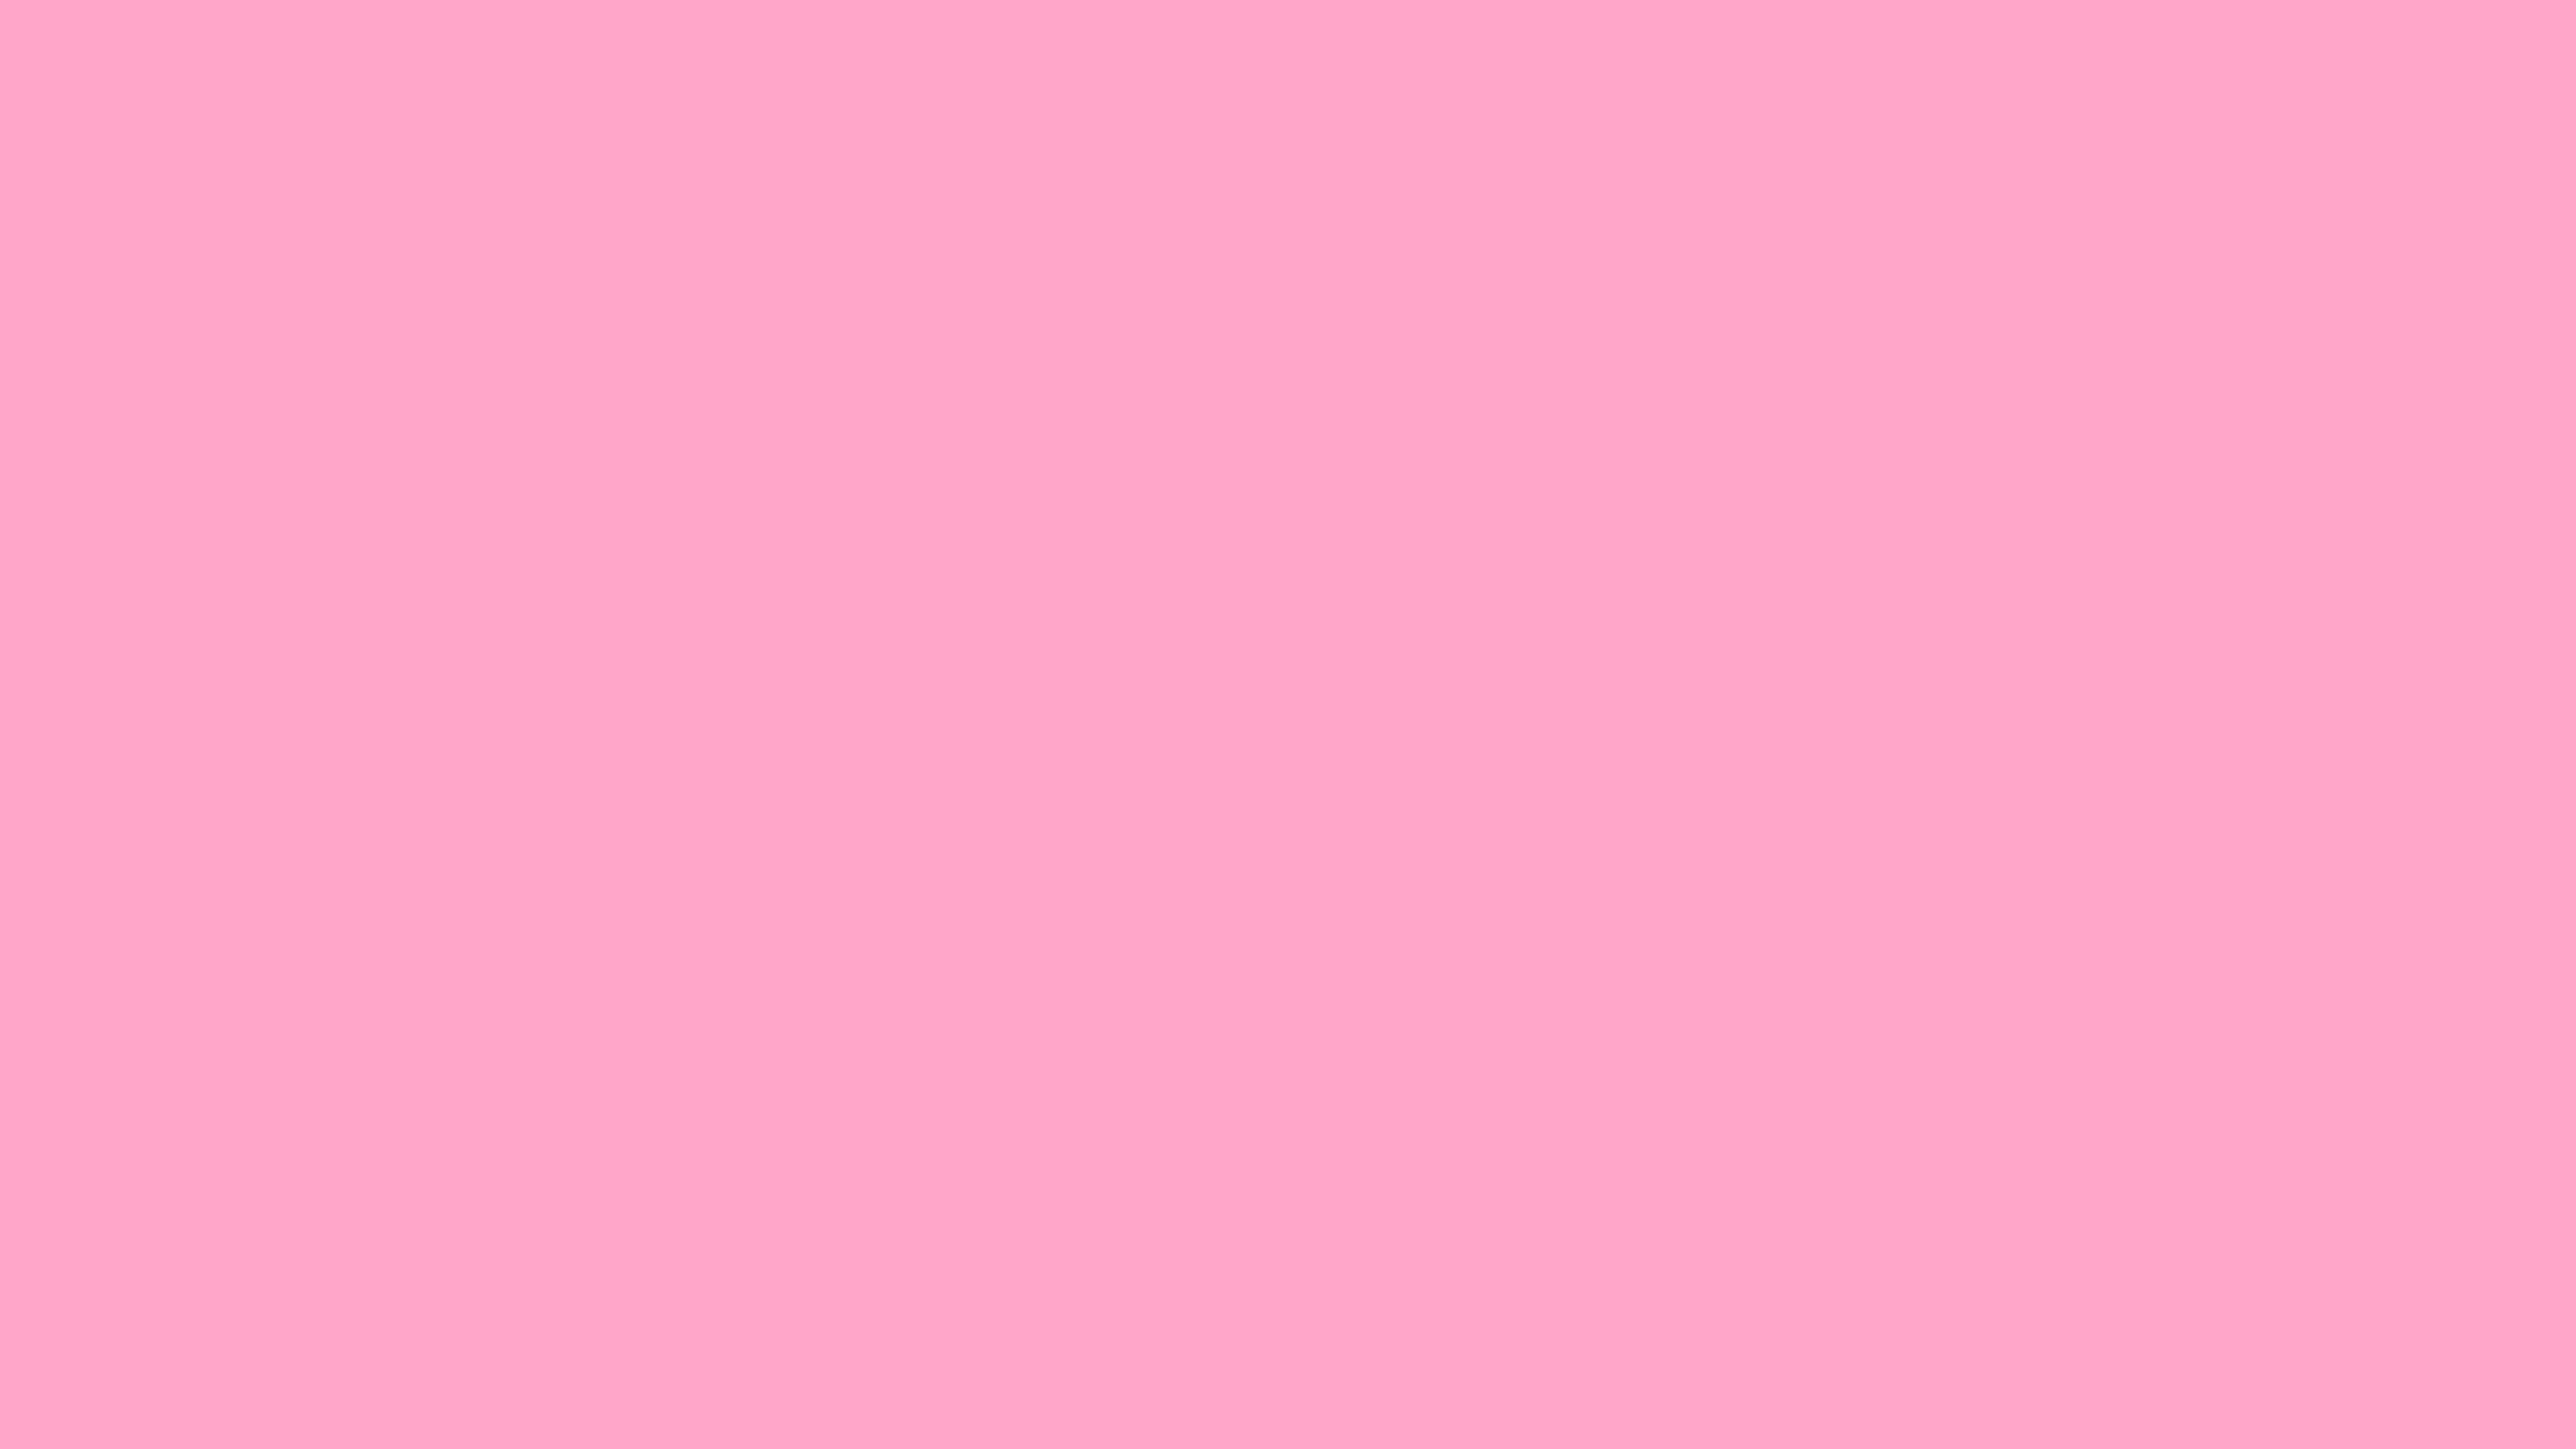 4096x2304 Carnation Pink Solid Color Background